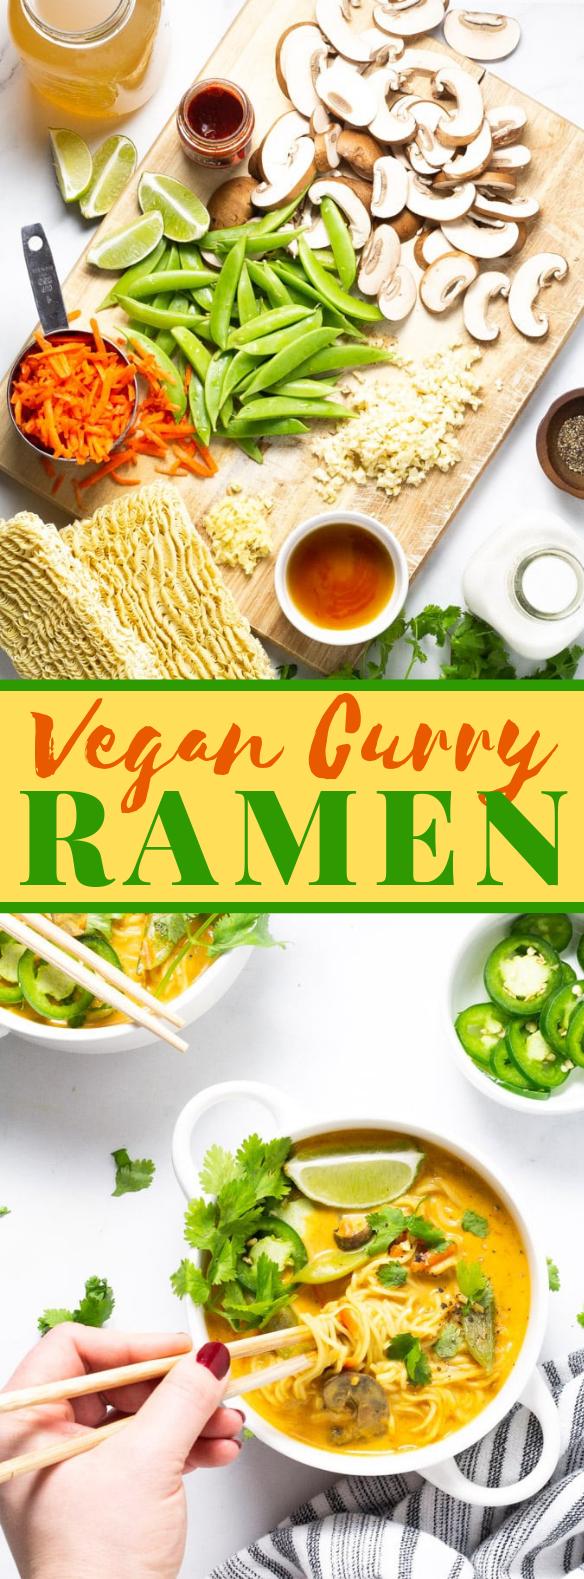 20 MINUTE VEGAN CURRY RAMEN #vegandinner #familyrecipe